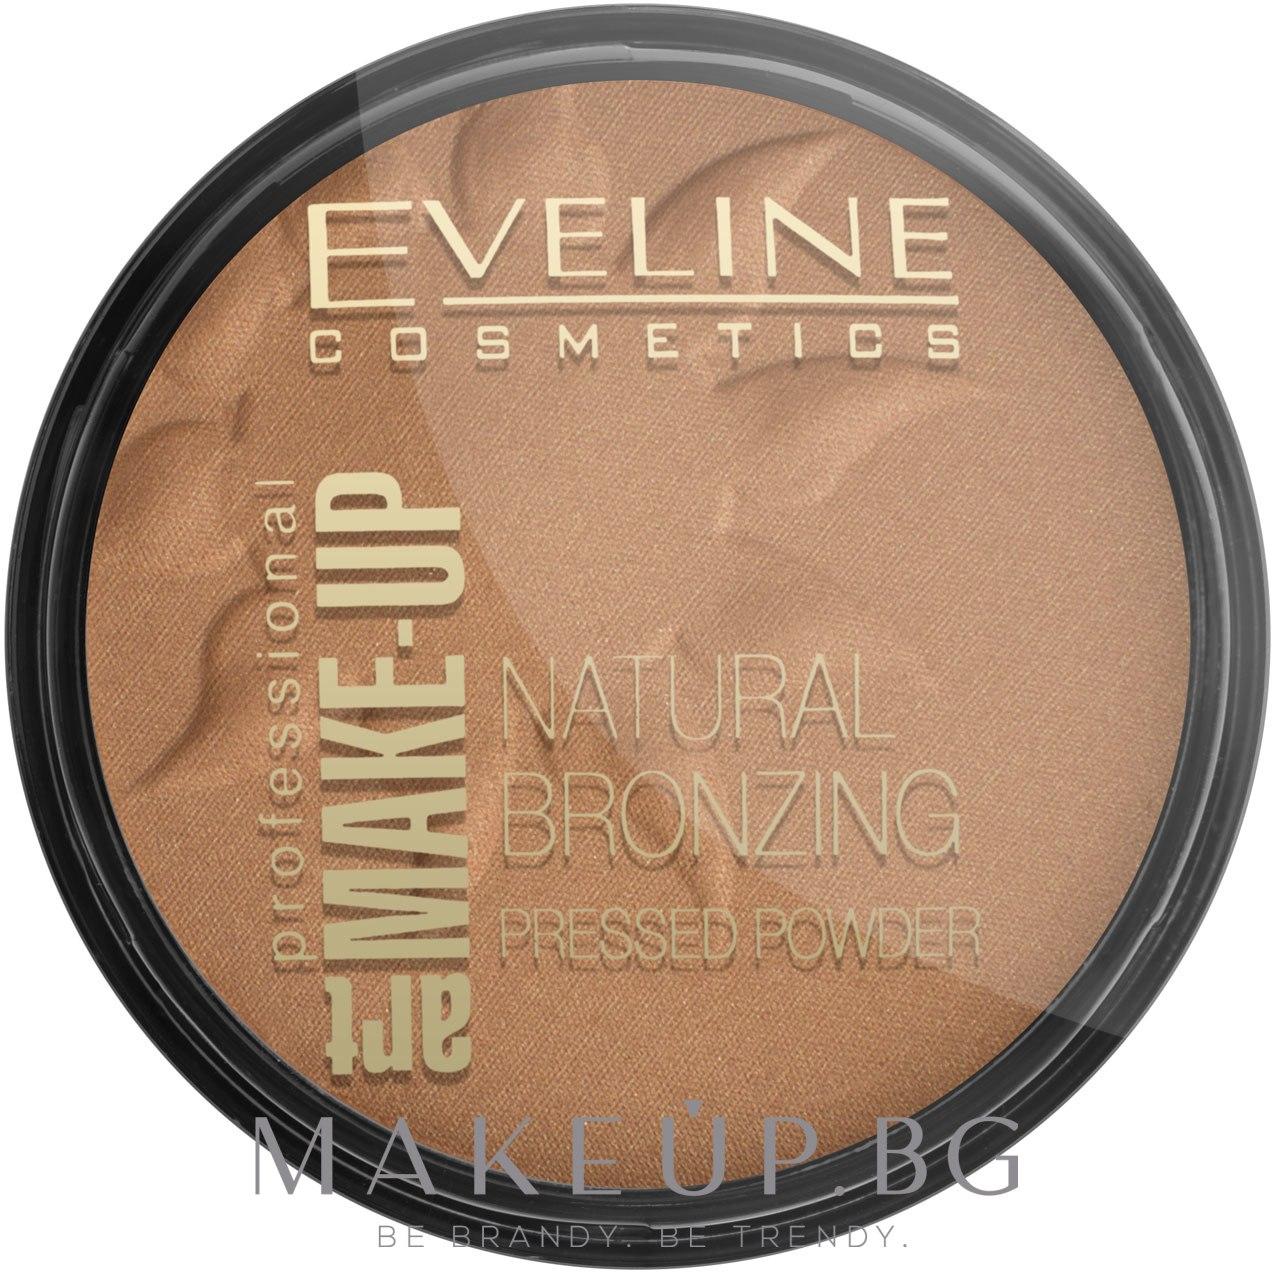 Компактна бронзираща пудра - Eveline Cosmetics Art Professional — снимка 50 - Shine